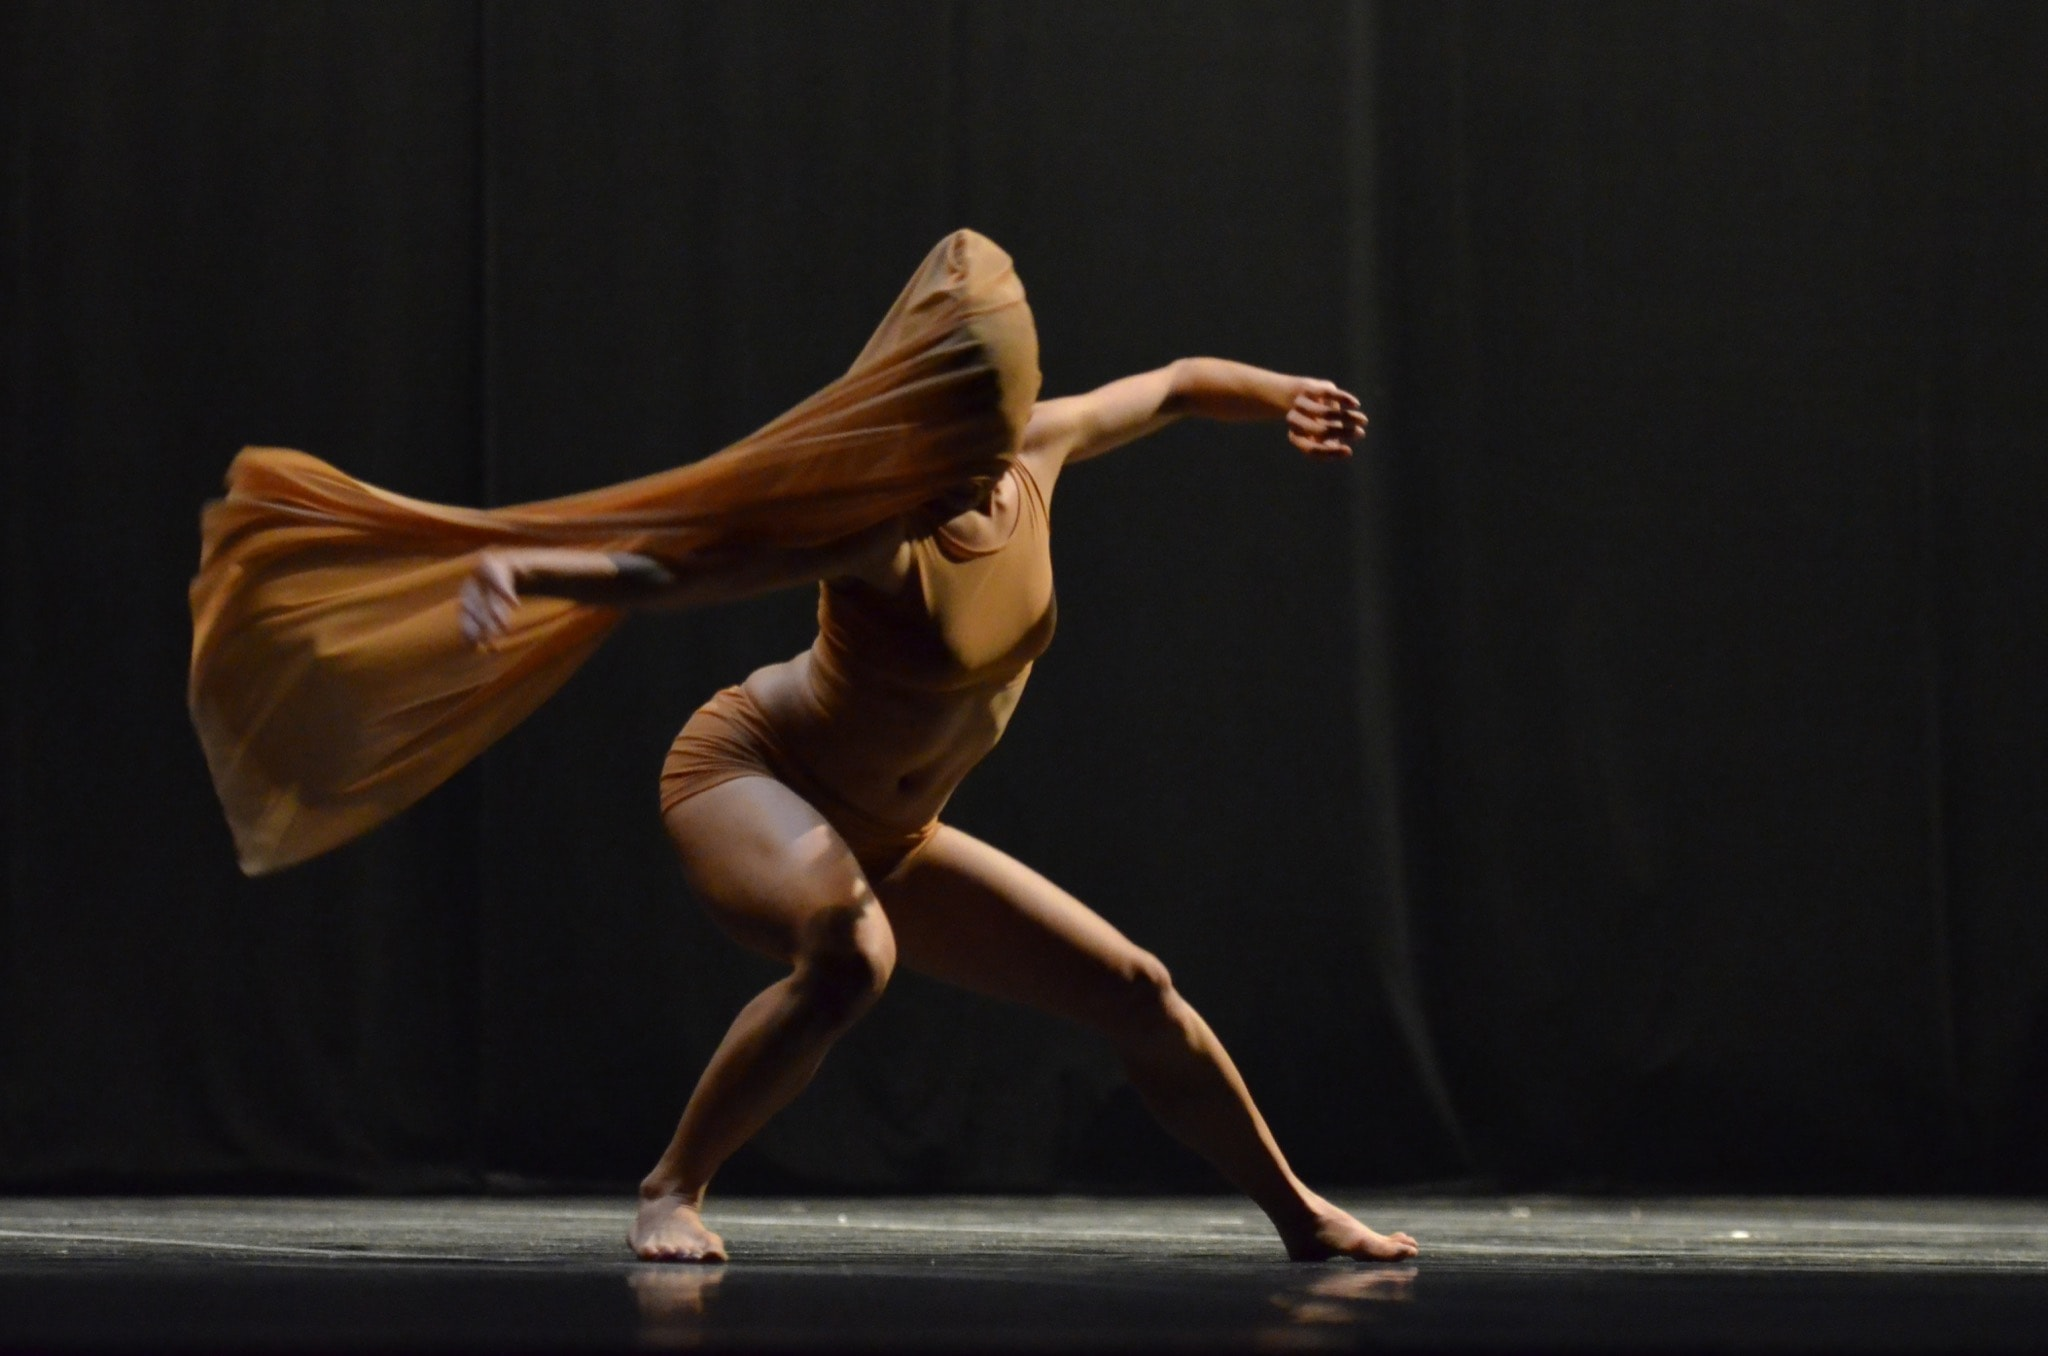 Danza Contemporánea de Cuba par Miguel Iglesias Ferrer photo danse